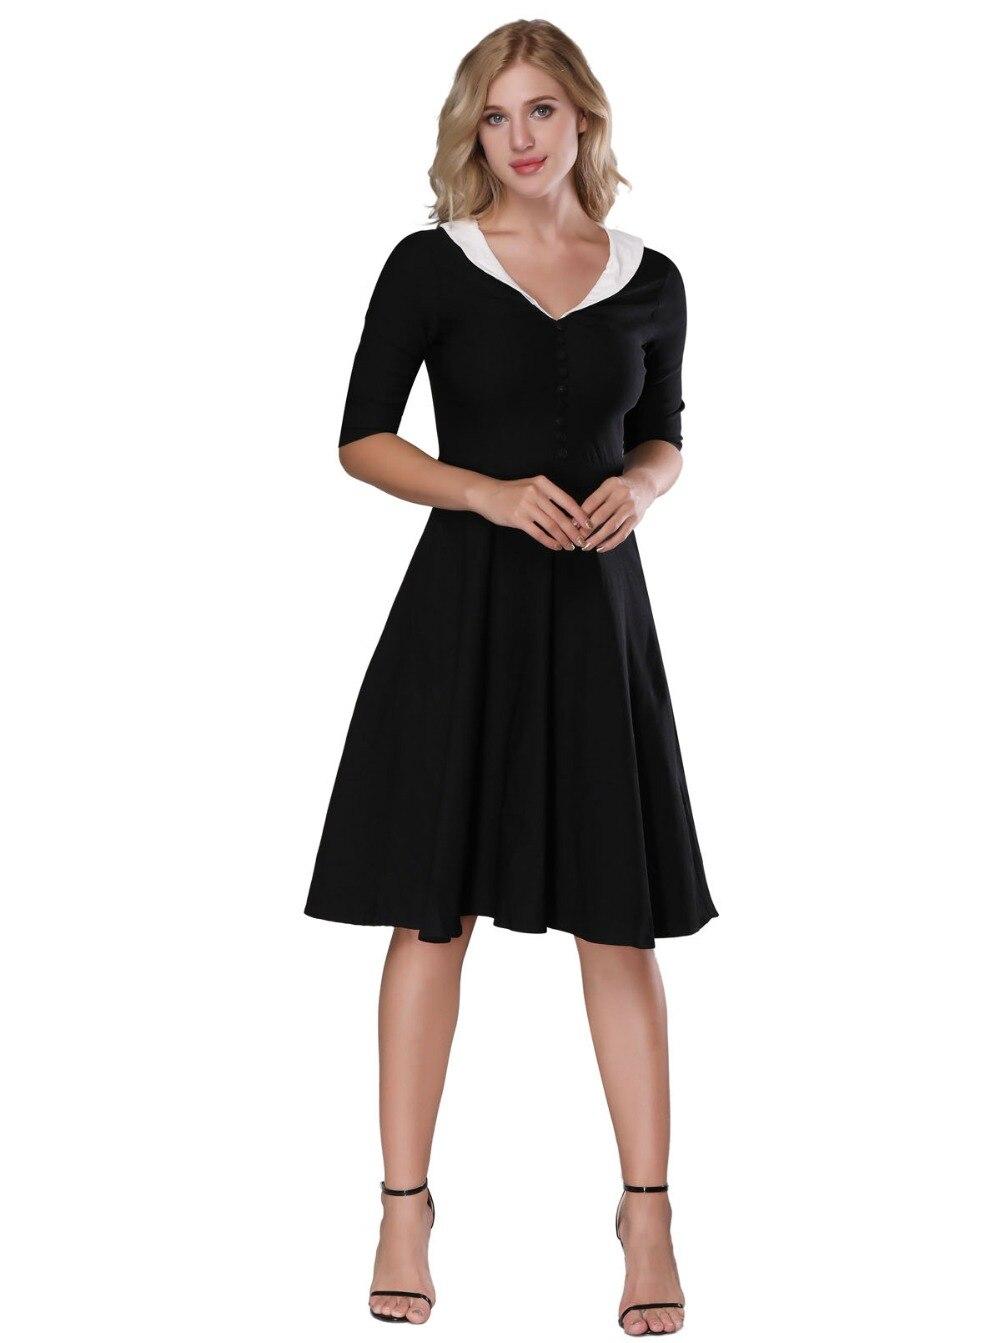 1950 Vintage Dresses For Women Fashion Ladies Cape Collar Retro ...